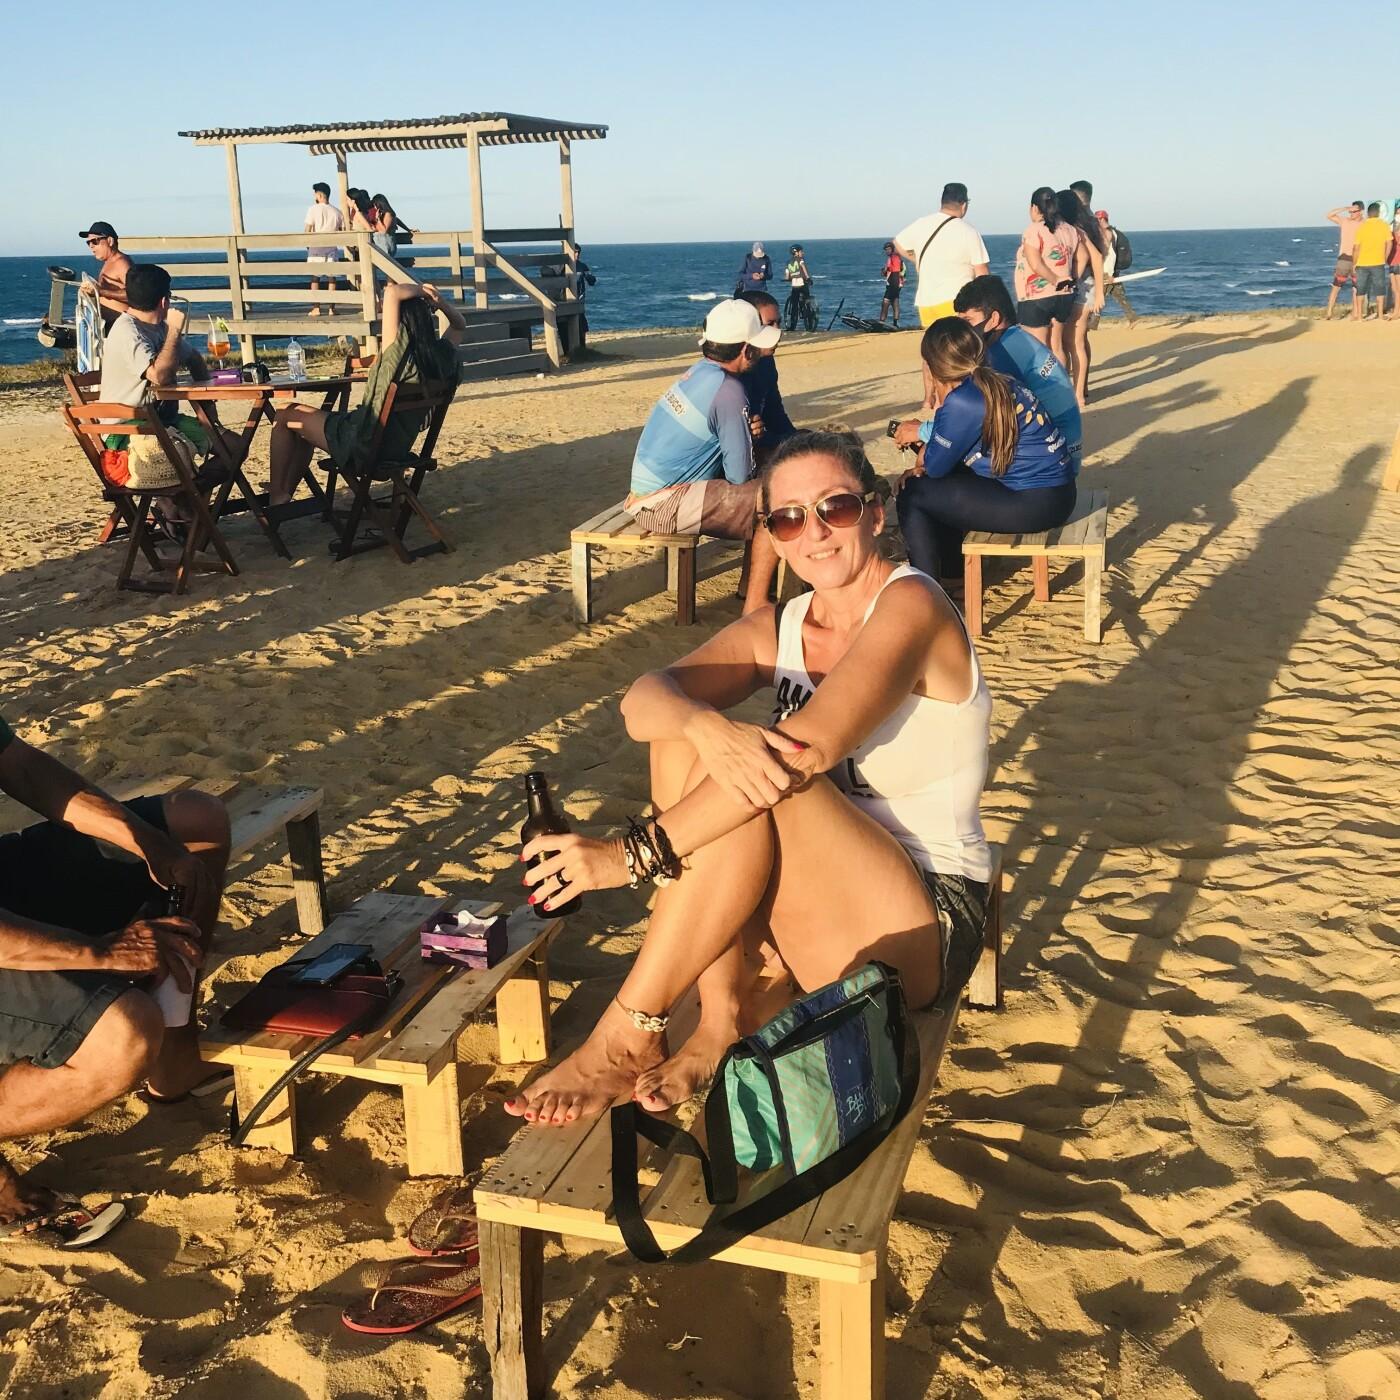 Laurence sur sa superbe plage au Brésil - 23 07 2021 - StereoChic Radio